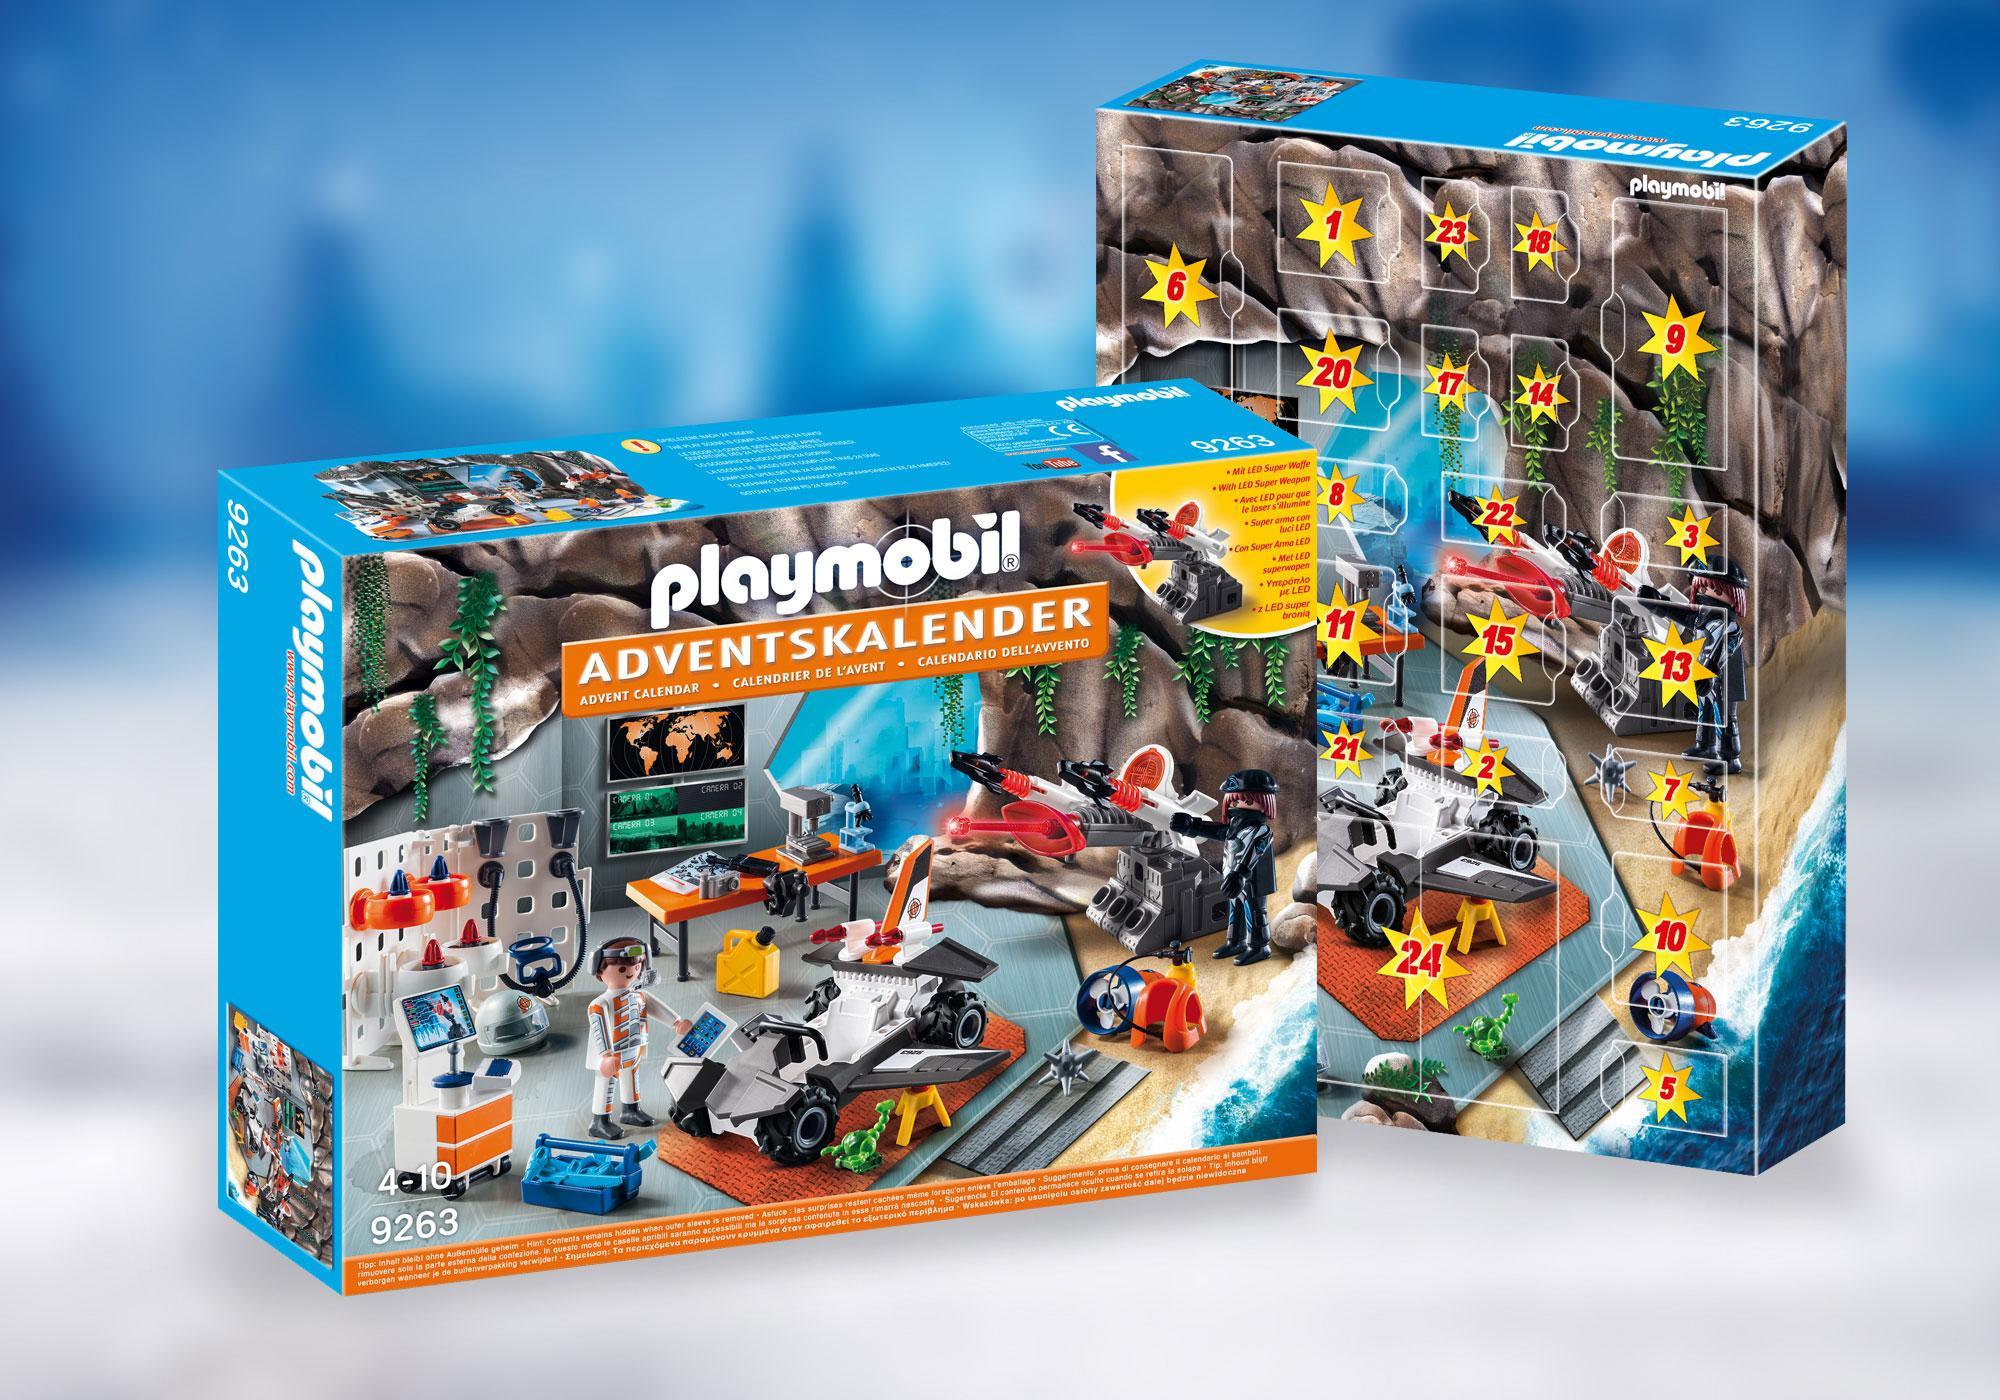 http://media.playmobil.com/i/playmobil/9263_product_detail